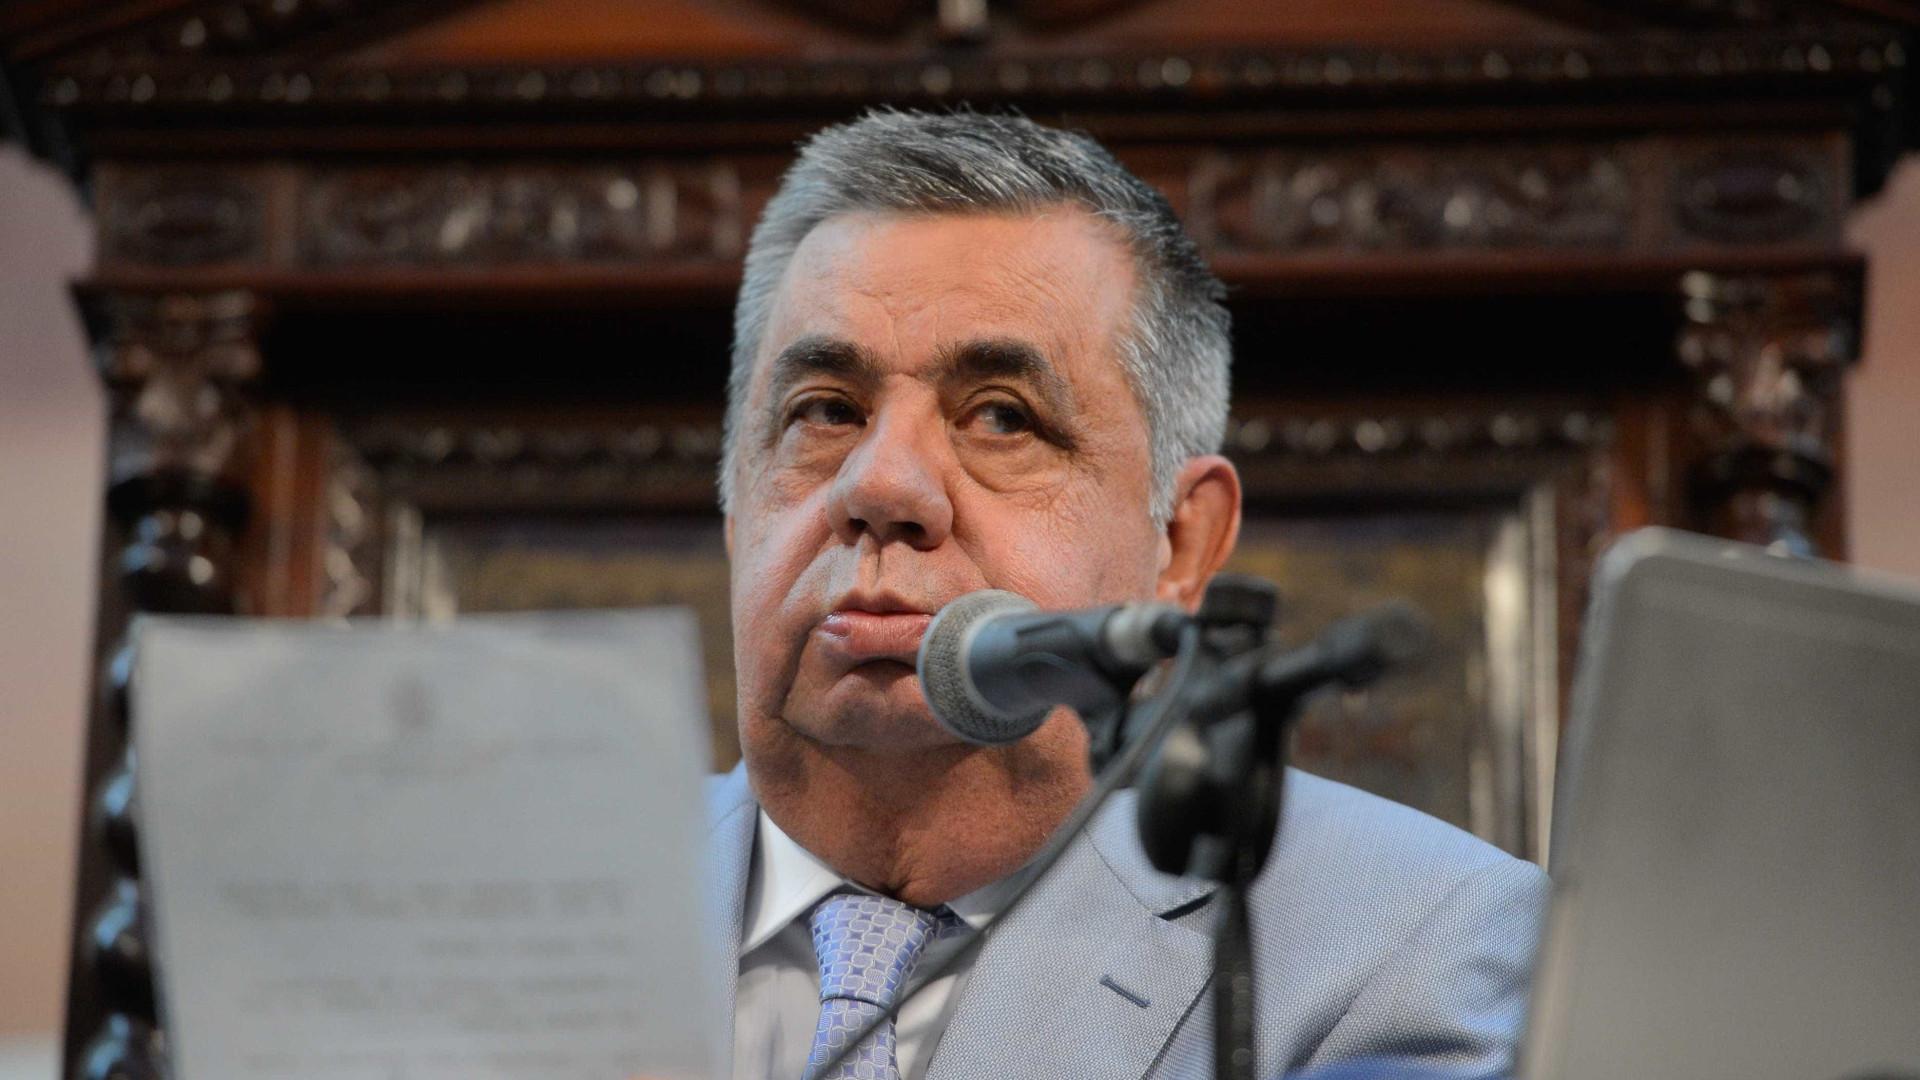 Morre Jorge Picciani, ex-presidente da Assembleia Legislativa do Rio